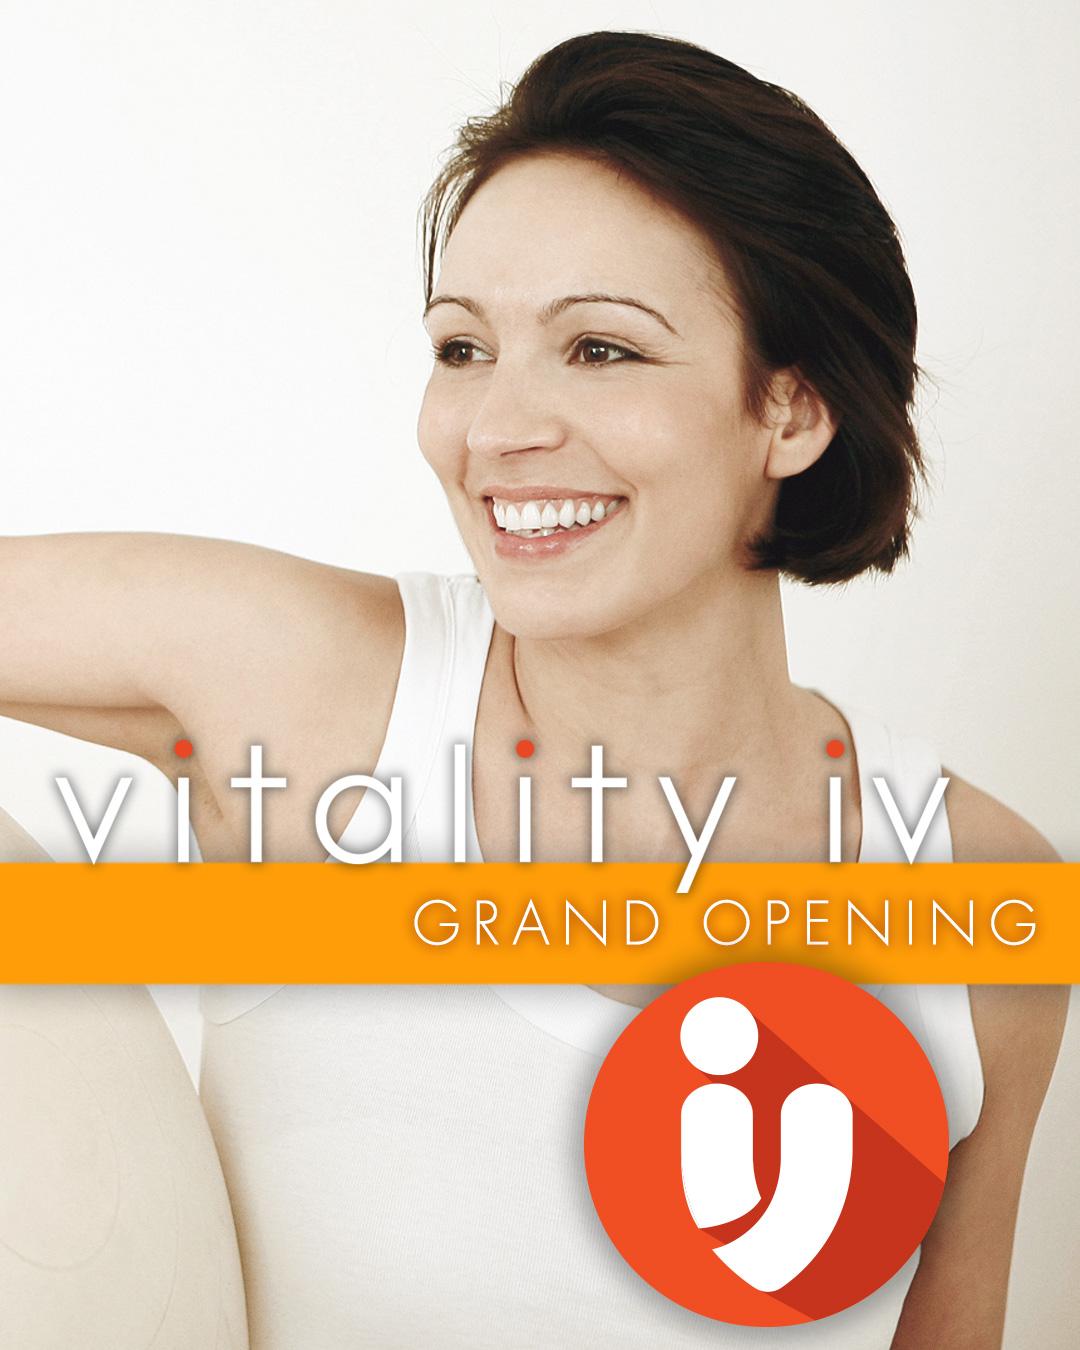 Vitality_IV_Grand_Opening-6.jpg